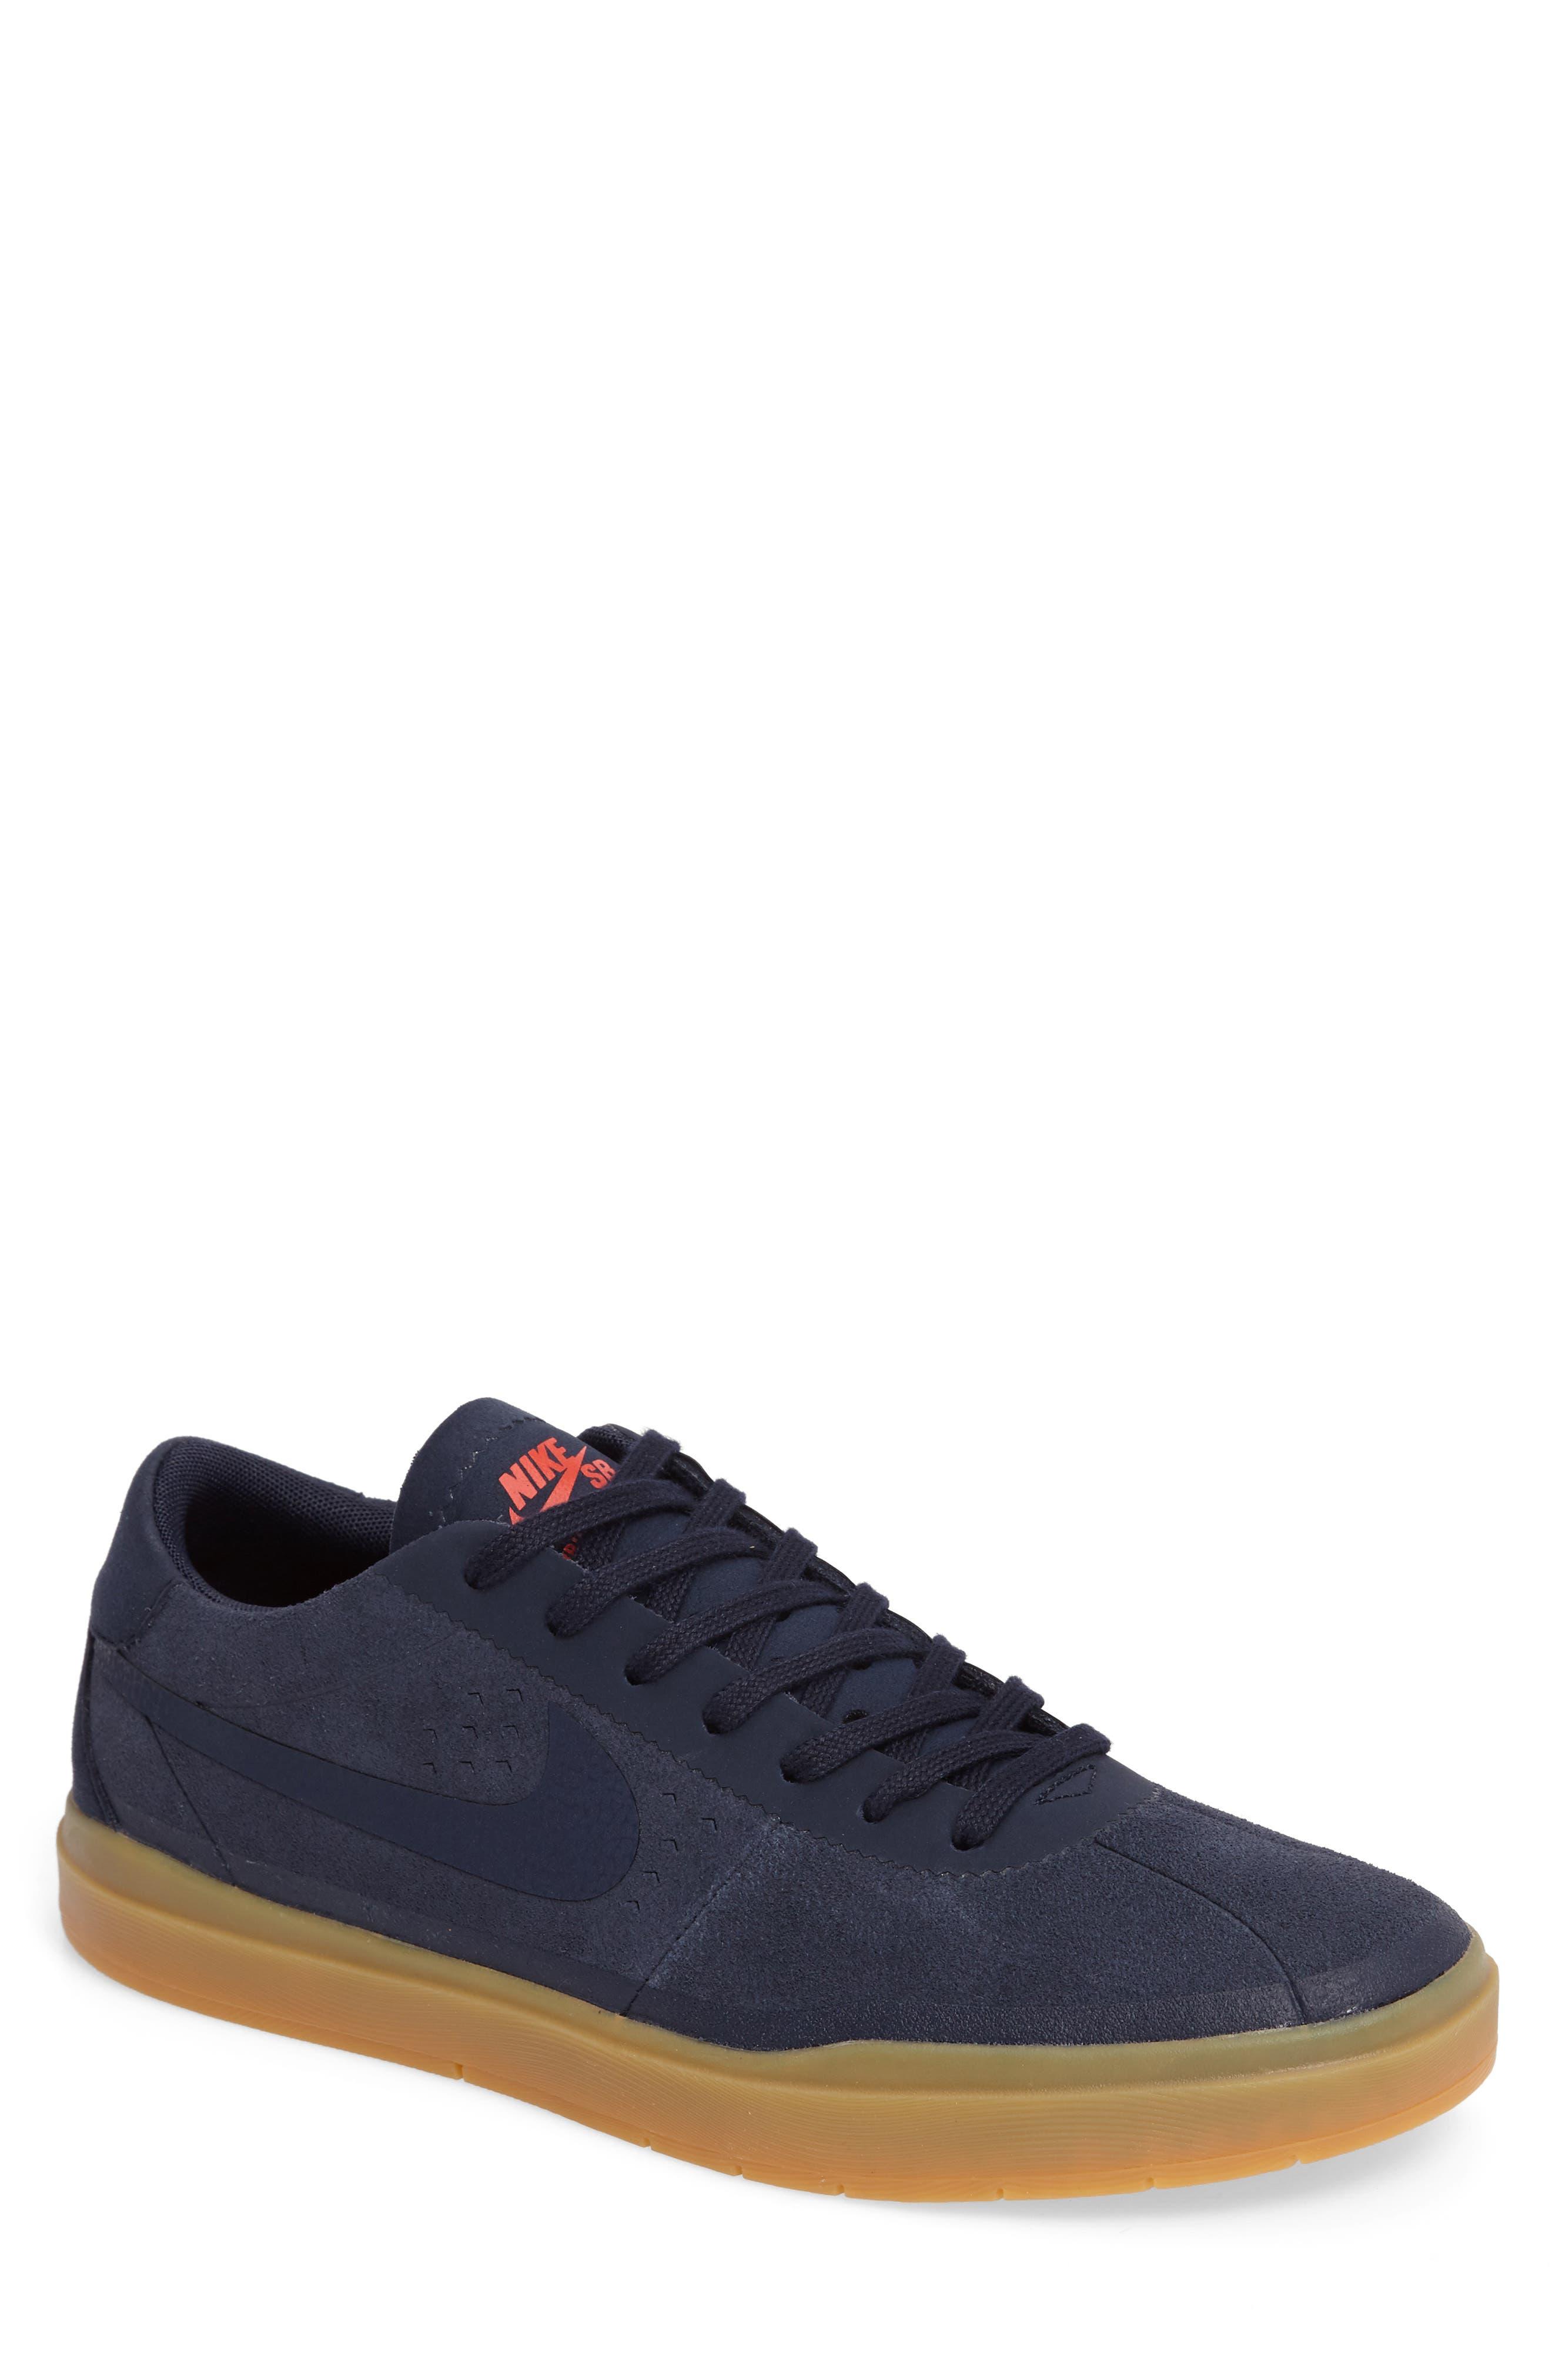 Bruin SB Hyperfeel Skate Shoe,                             Main thumbnail 1, color,                             Obsidian/ Obsidian/ Gum